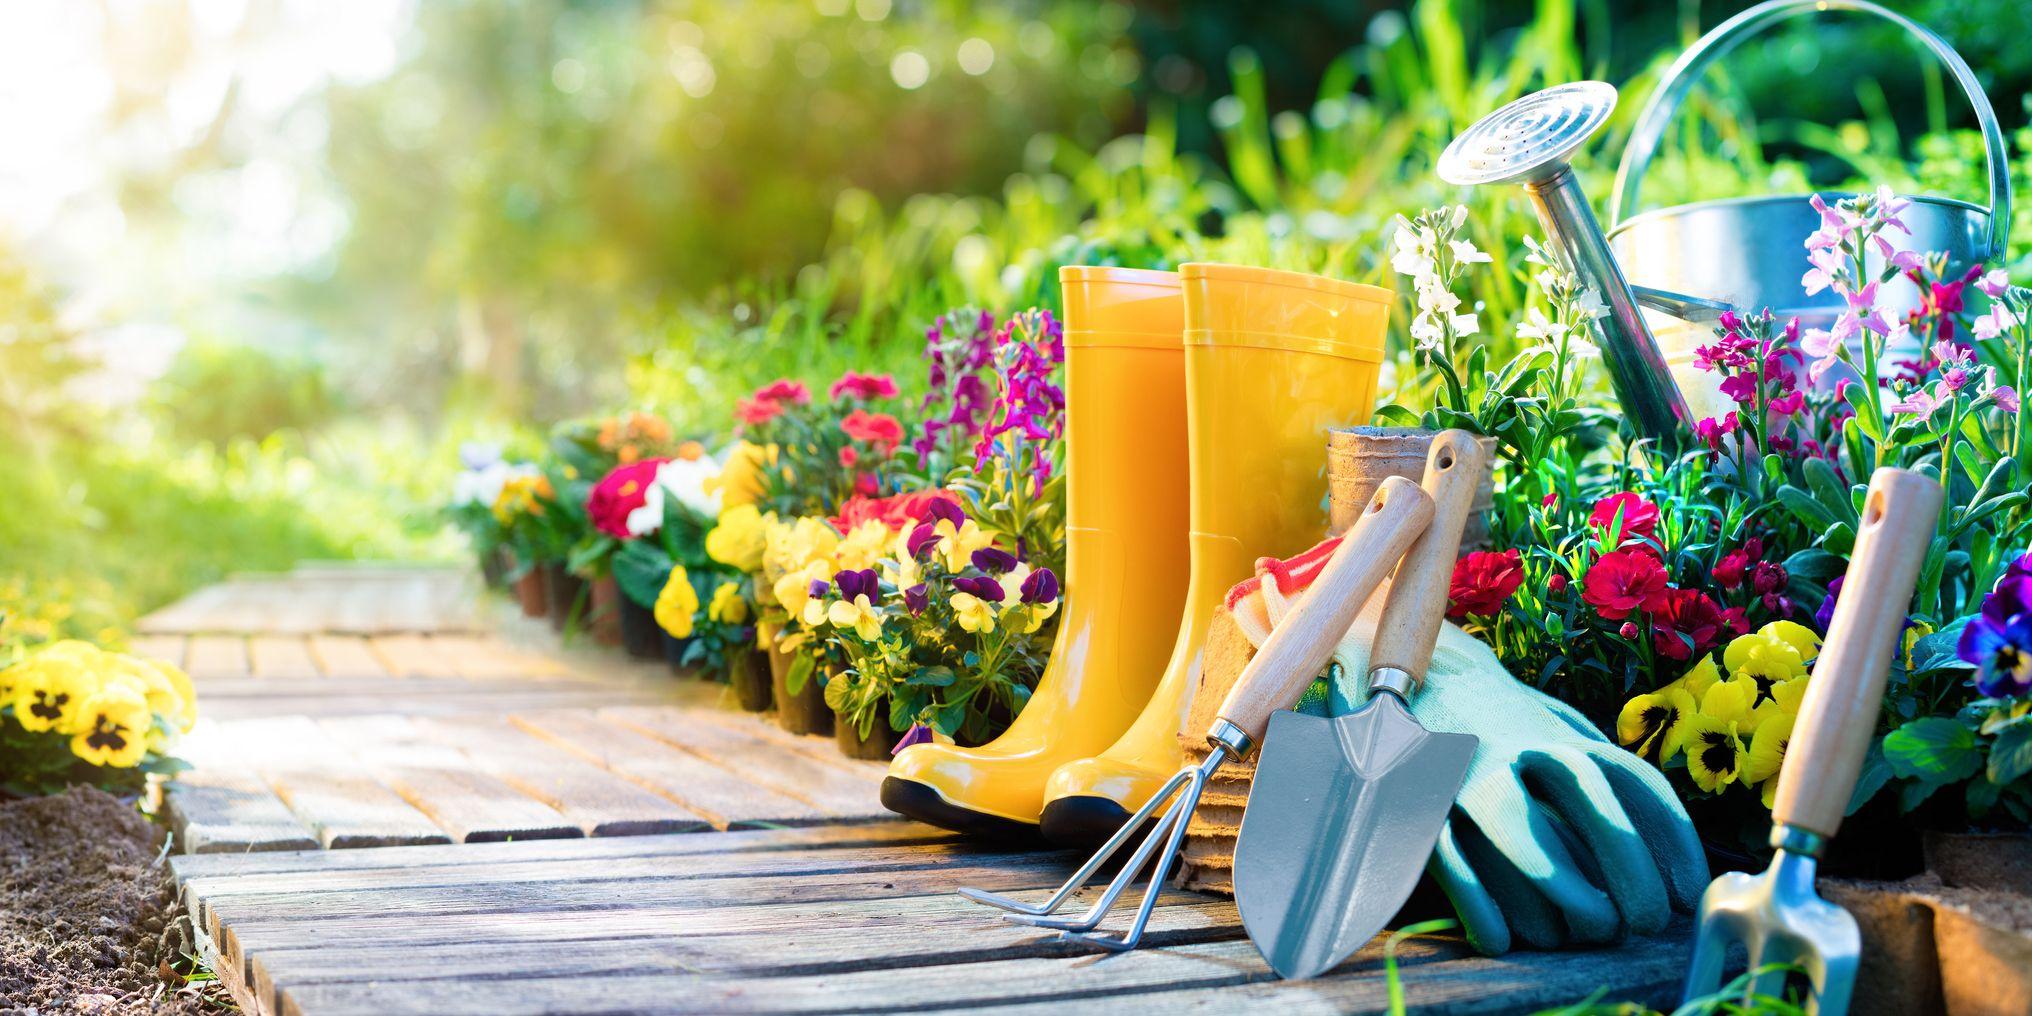 Organic Gardening - How to Start an Organic Garden on Gardening  id=36144